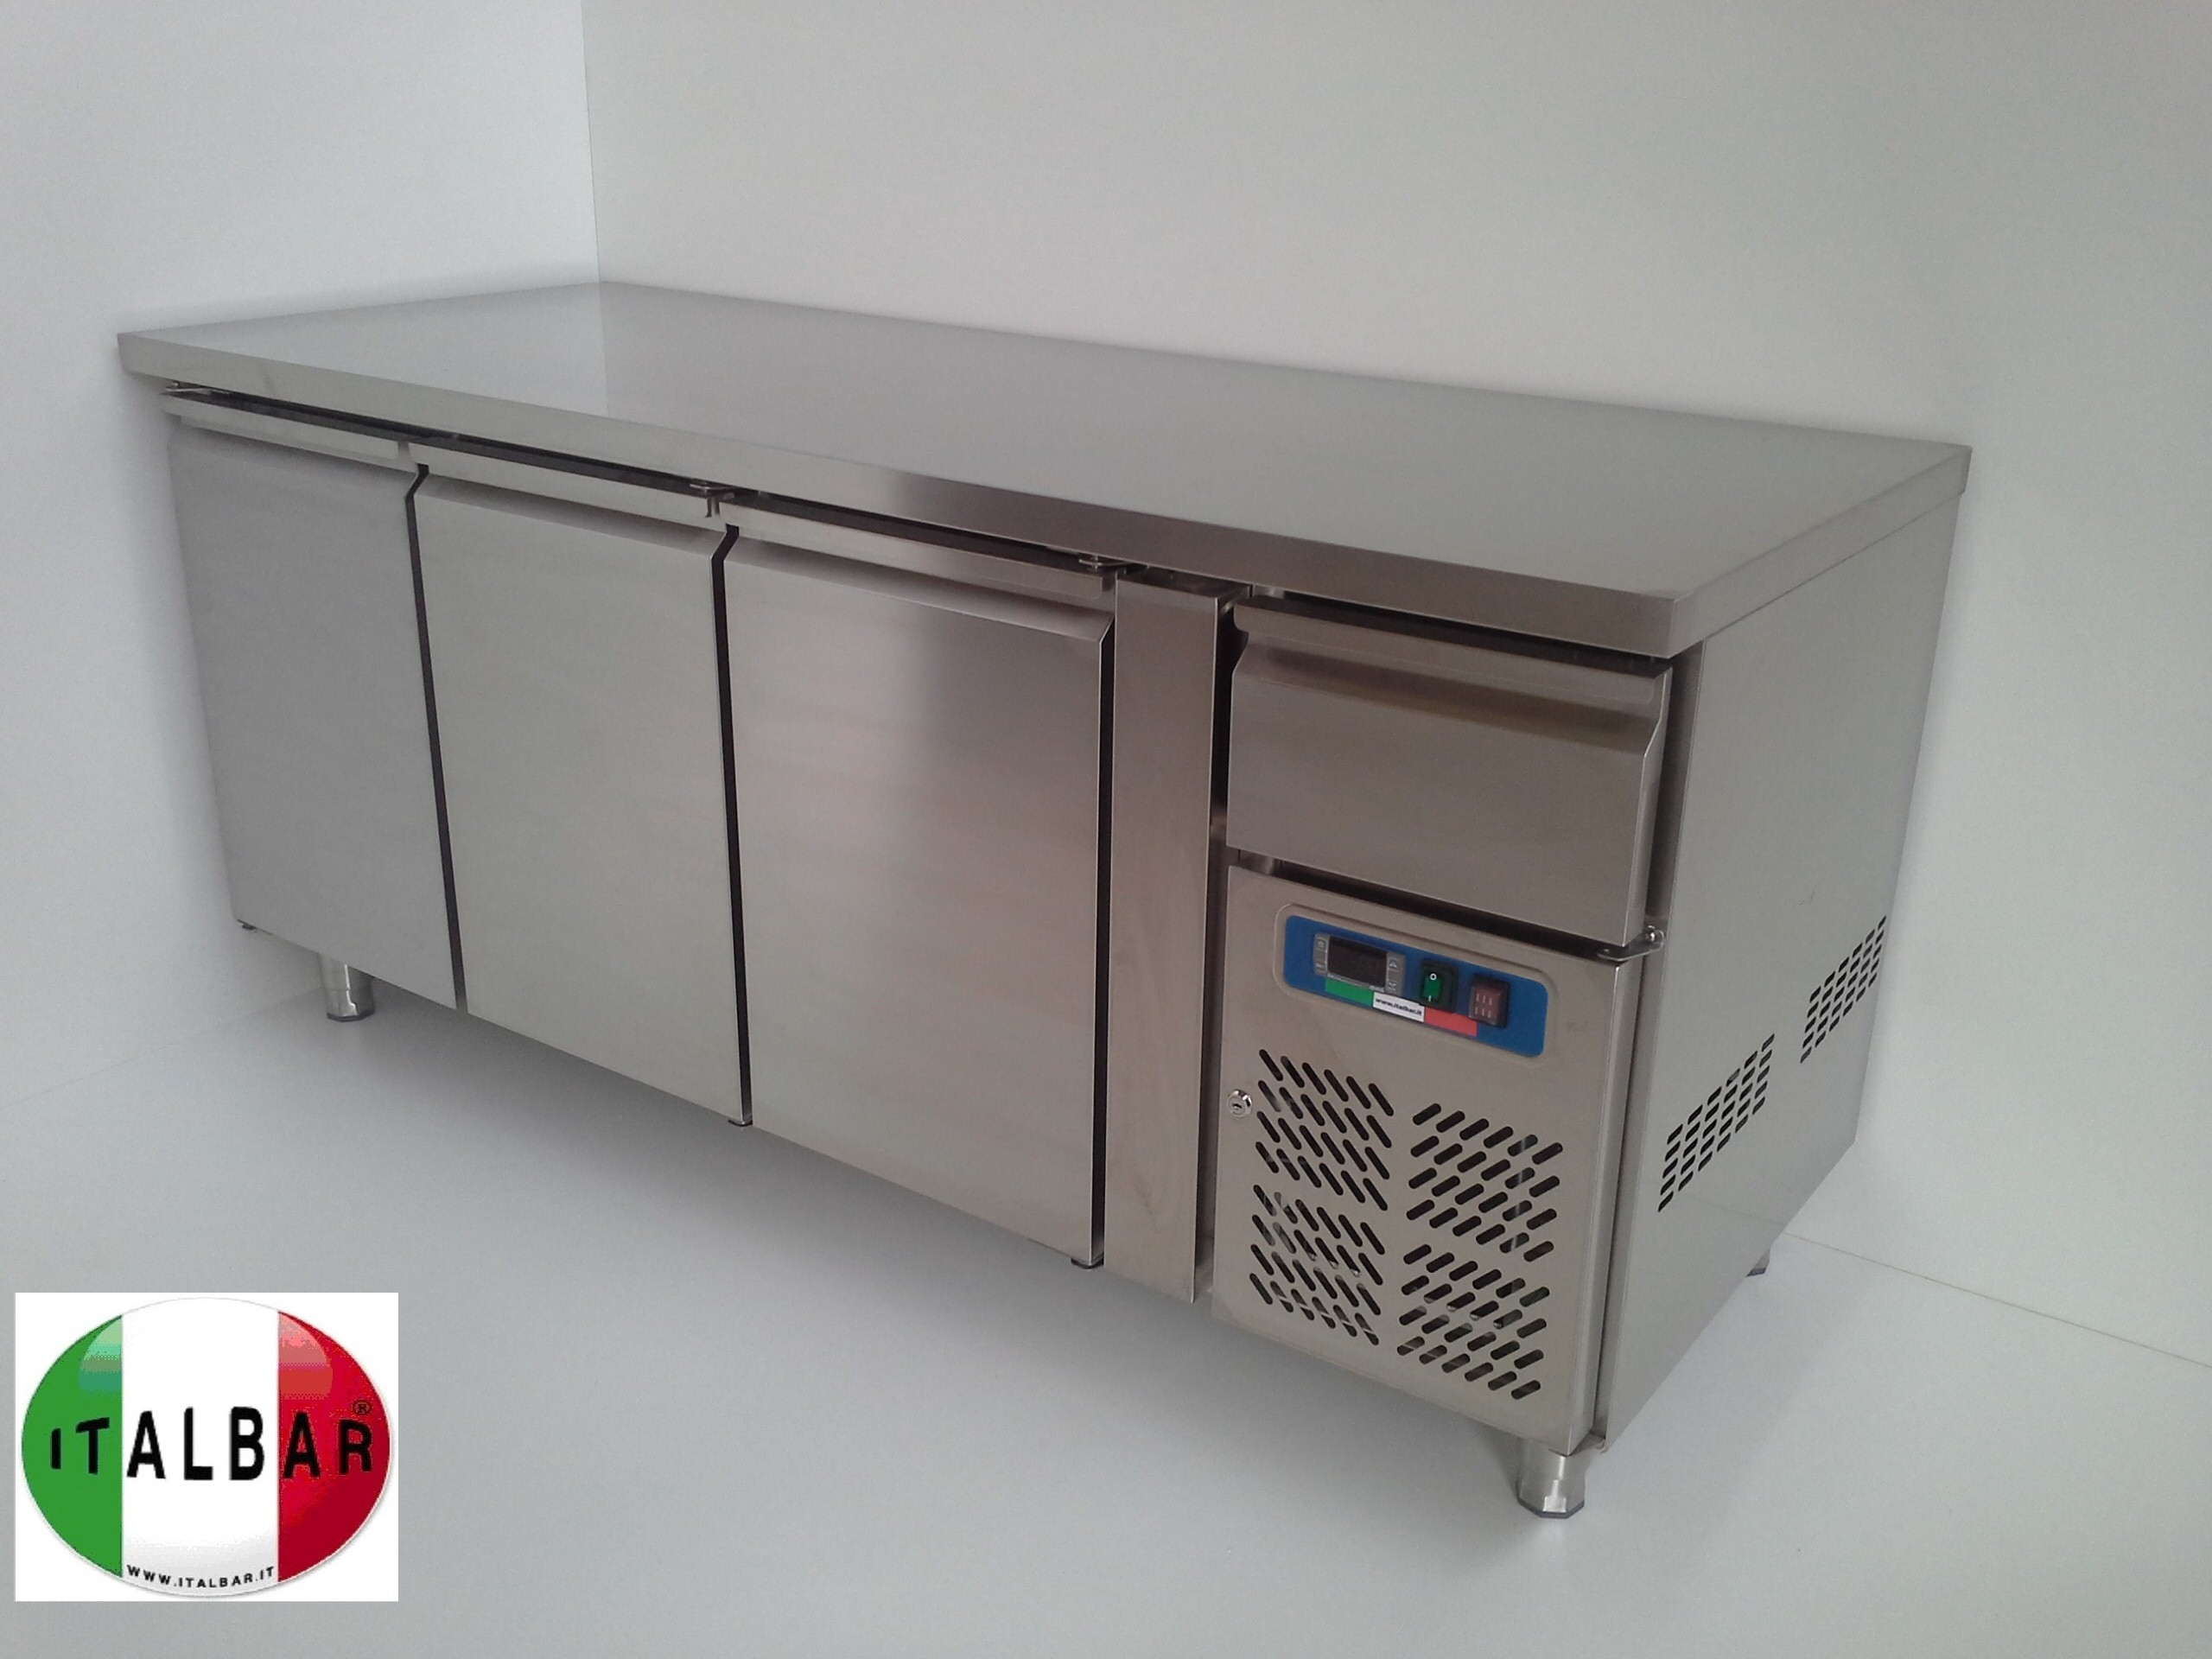 Banconi frigo banchi bar banconi bar produttori di for Bancone bar prezzi